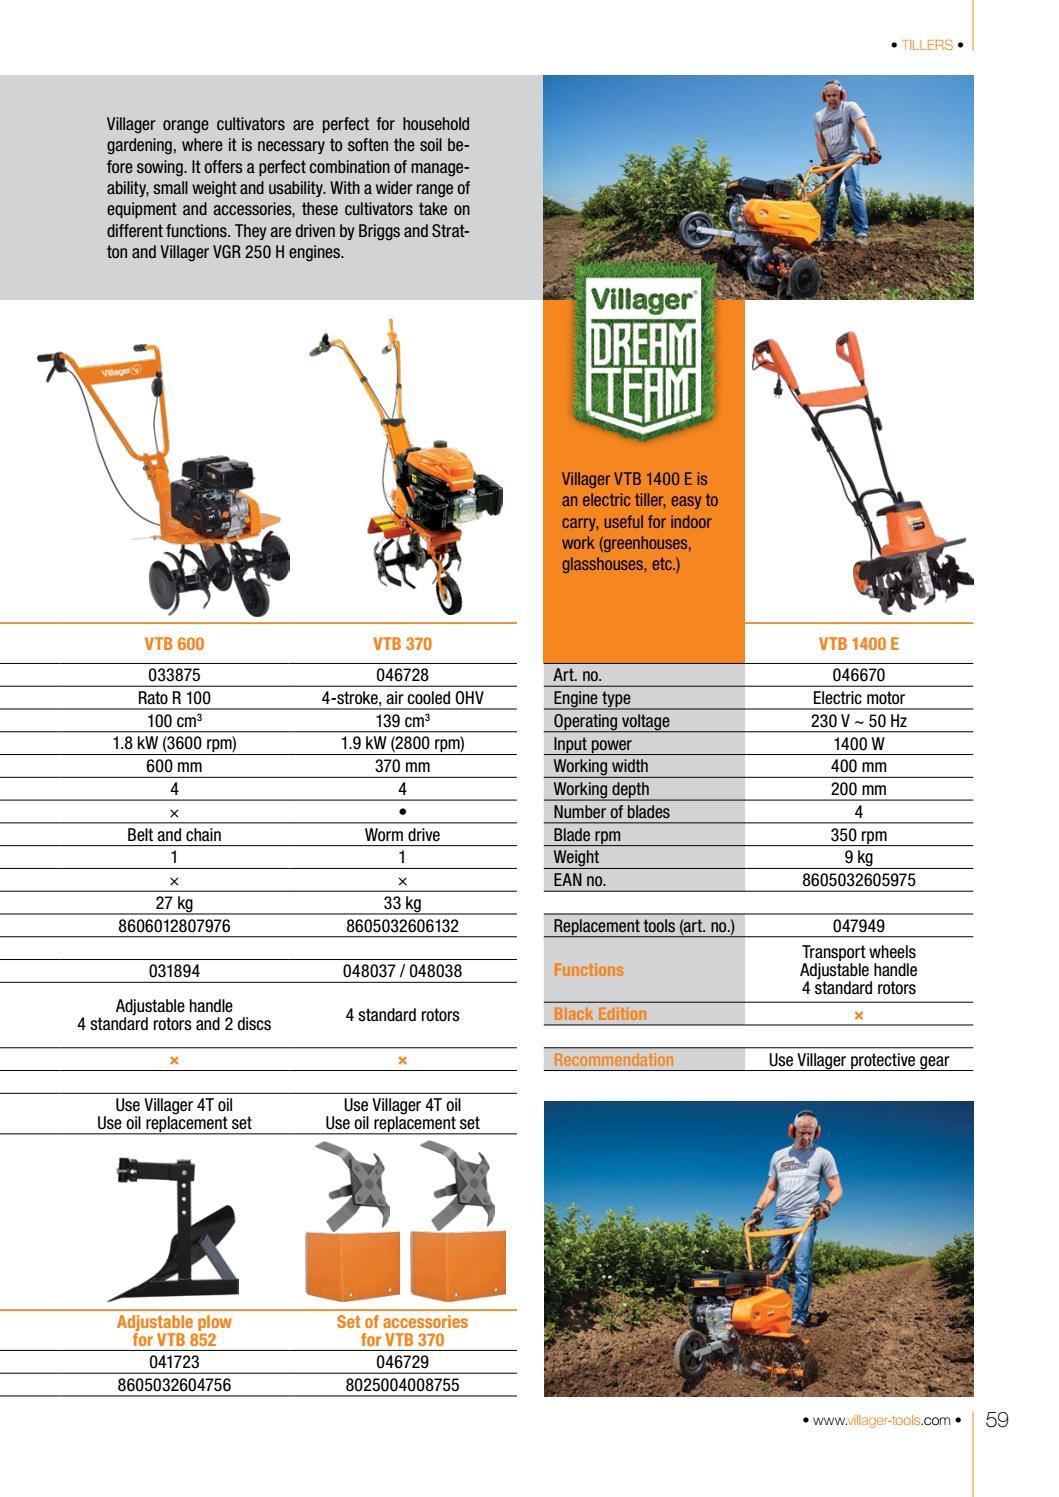 Katalog garden 2018 eng web by Agromarket - issuu